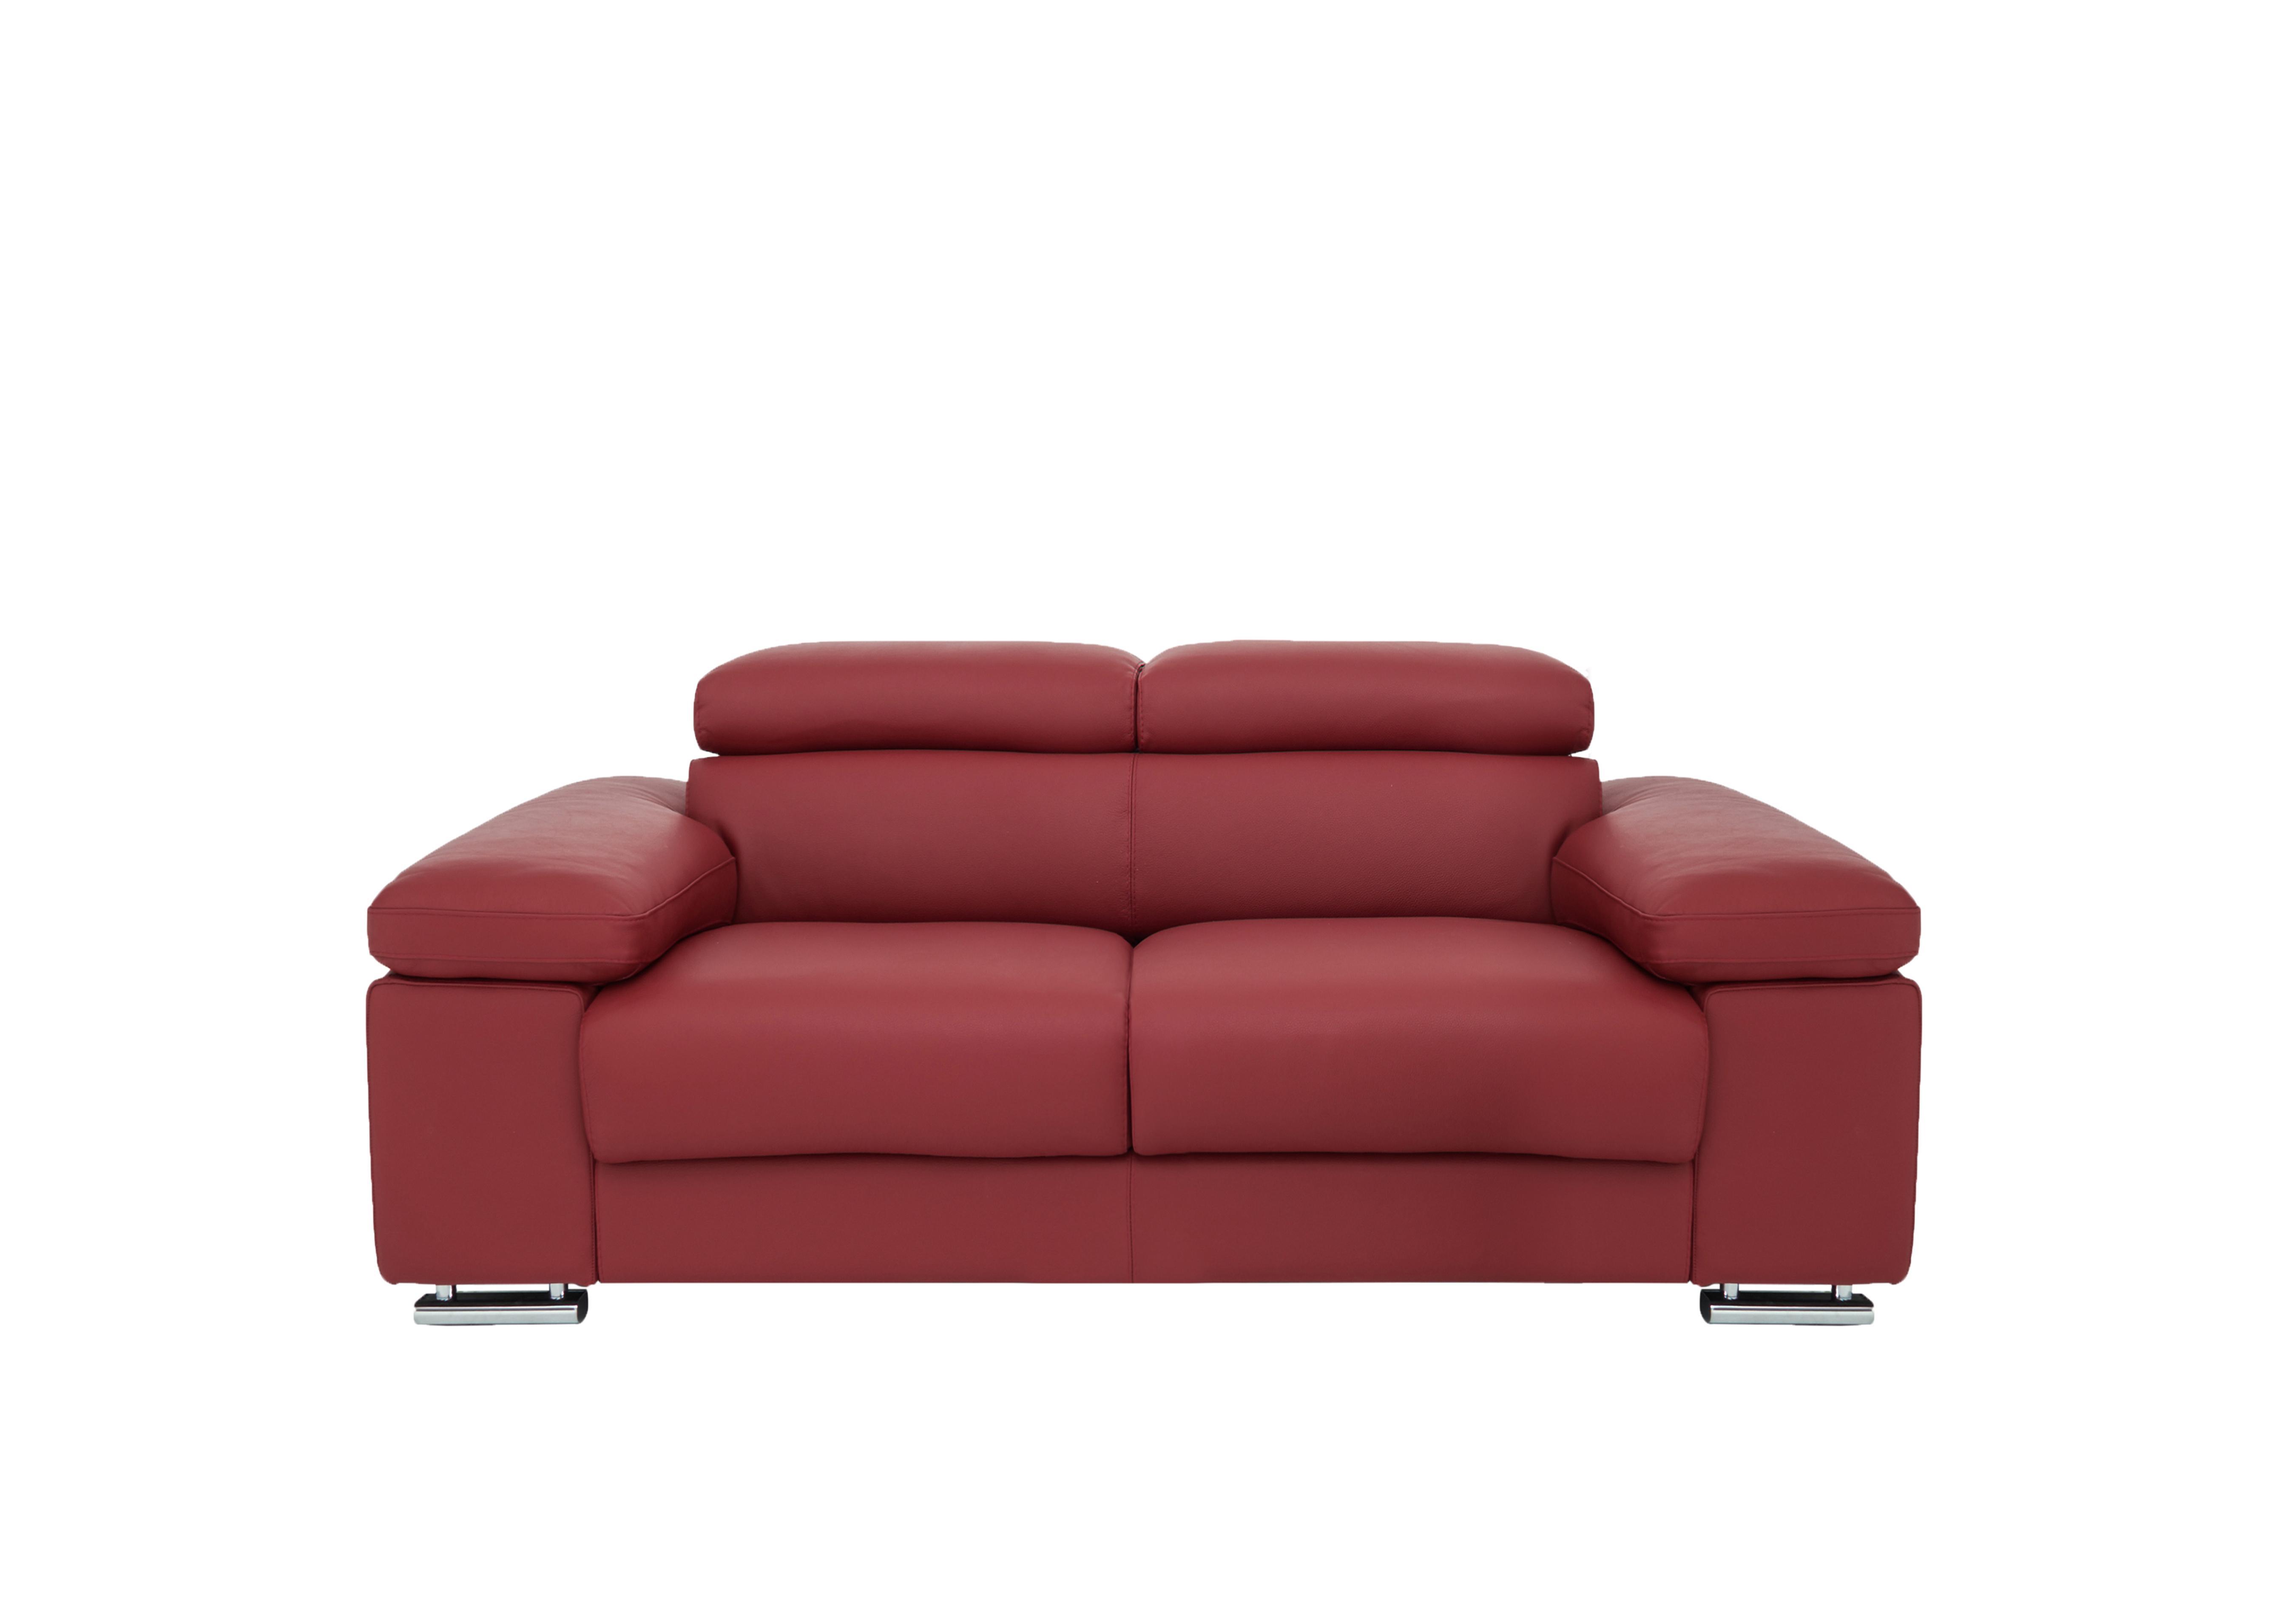 sanova 2 seater leather sofa nicoletti furniture village rh furniturevillage co uk